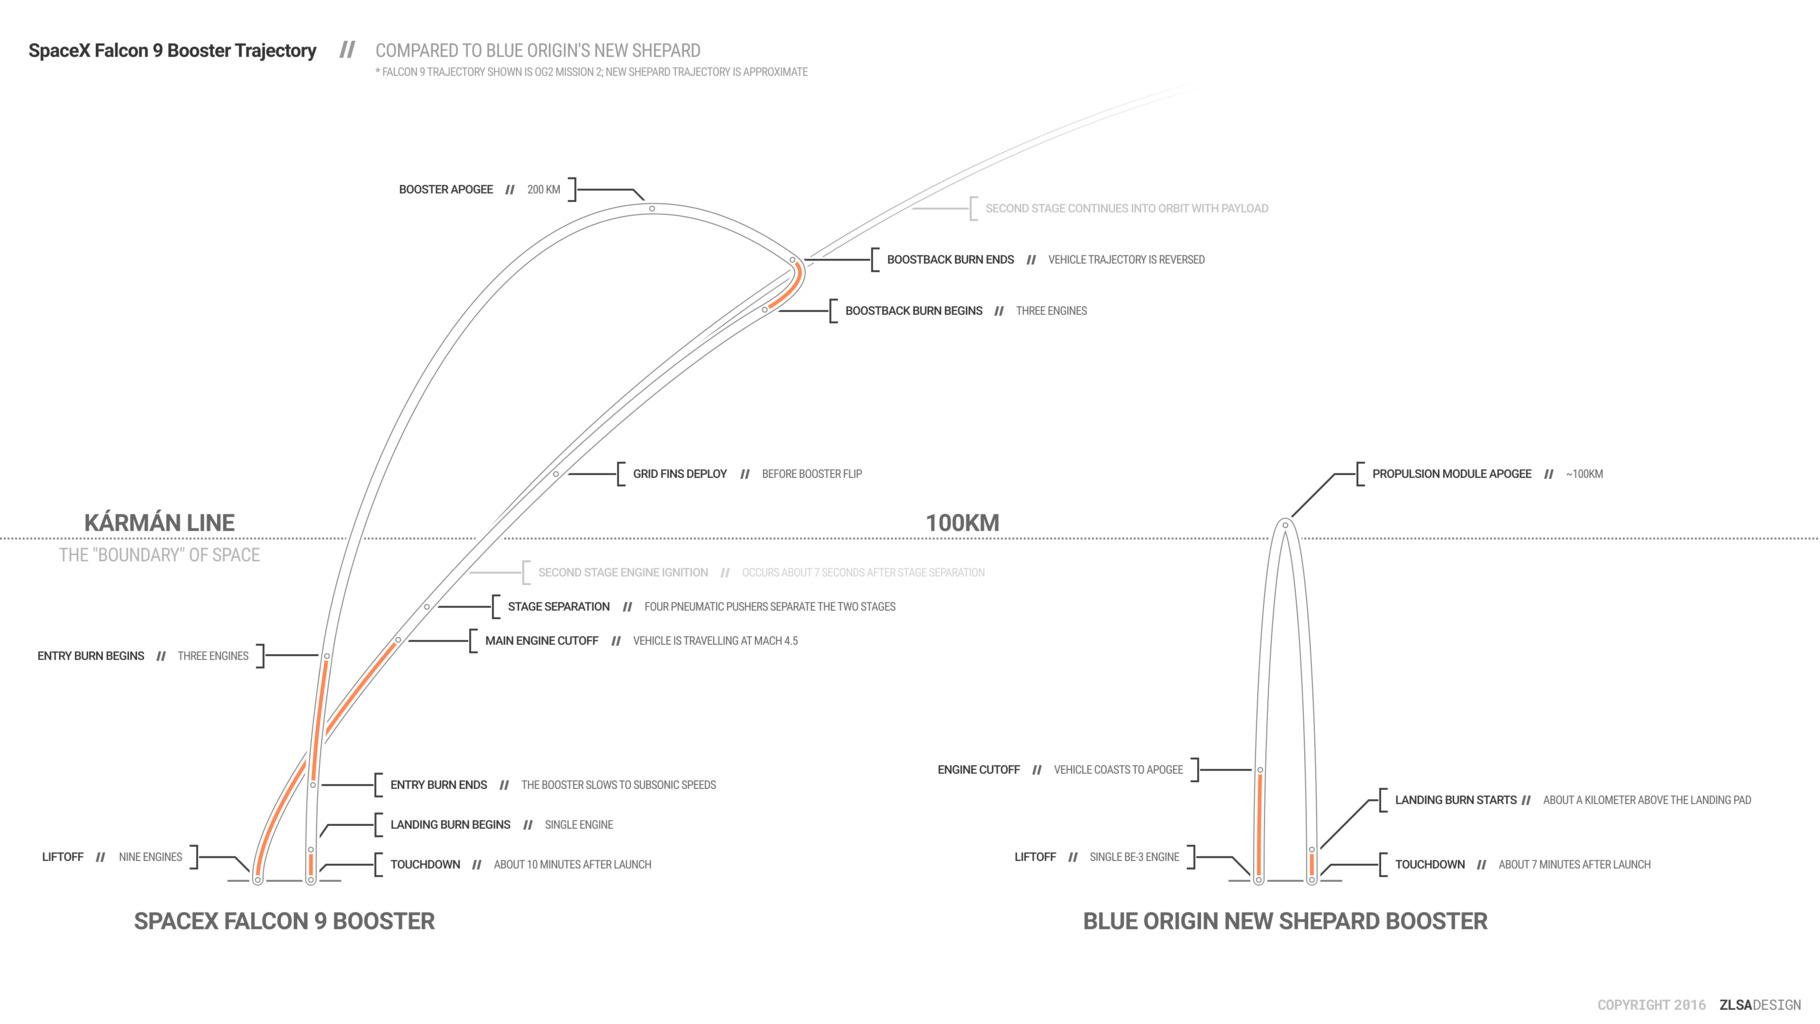 SpaceX Falcon 9 Booster Trajectory compared to Blue Origin's New Shepard